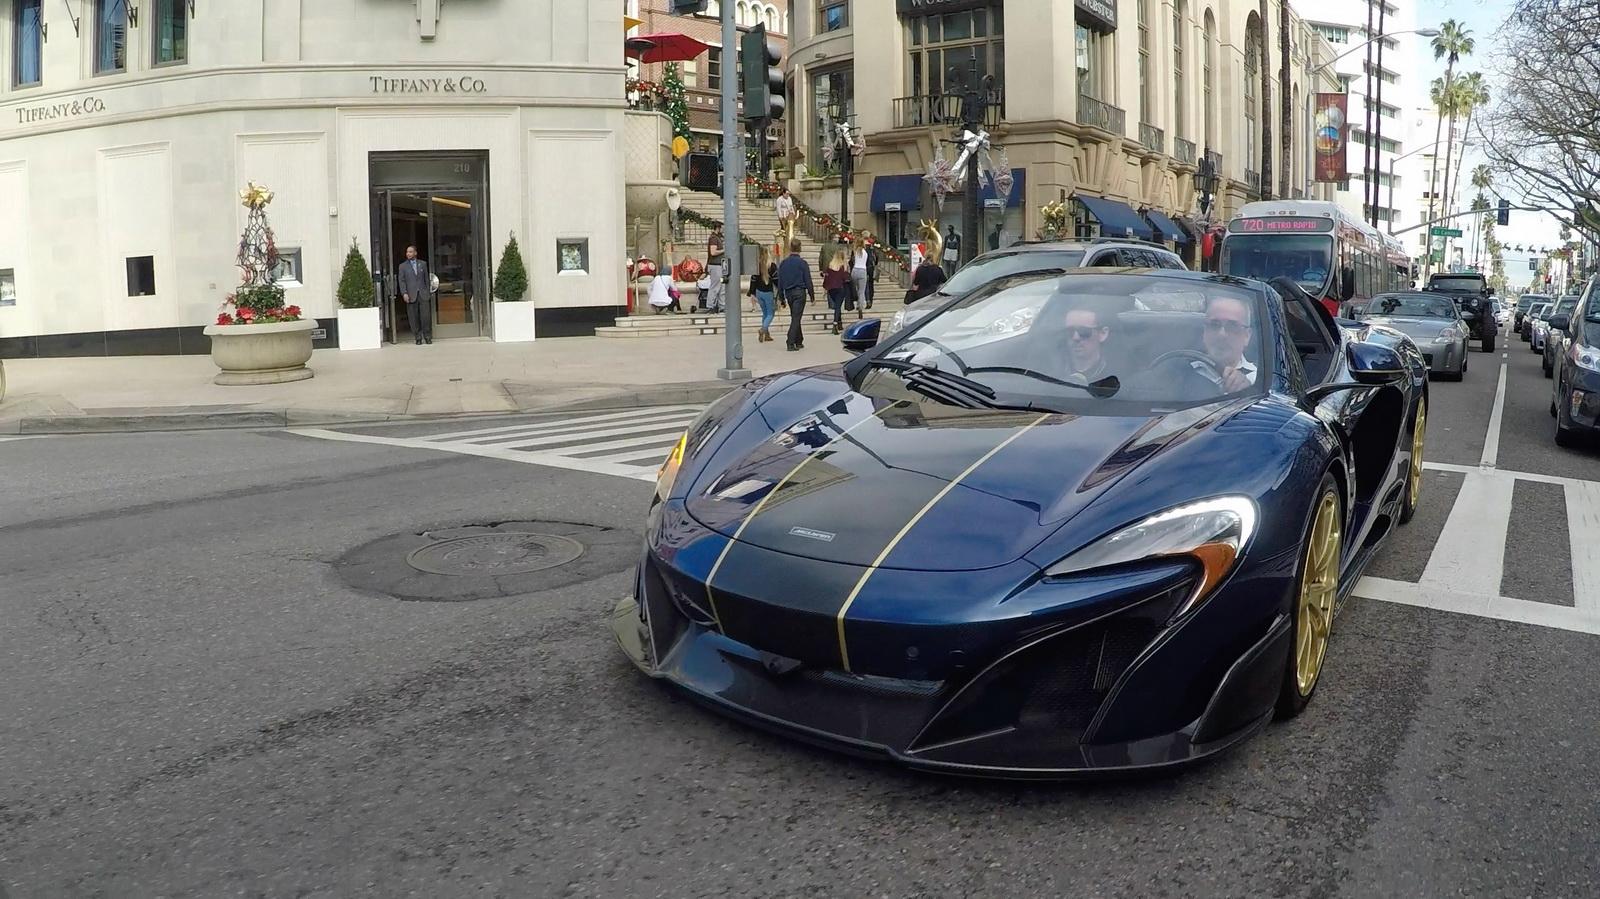 Mclaren Beverly Hills >> World's Most Expensive McLaren 675LT Has Wheel Weights Made Of Gold